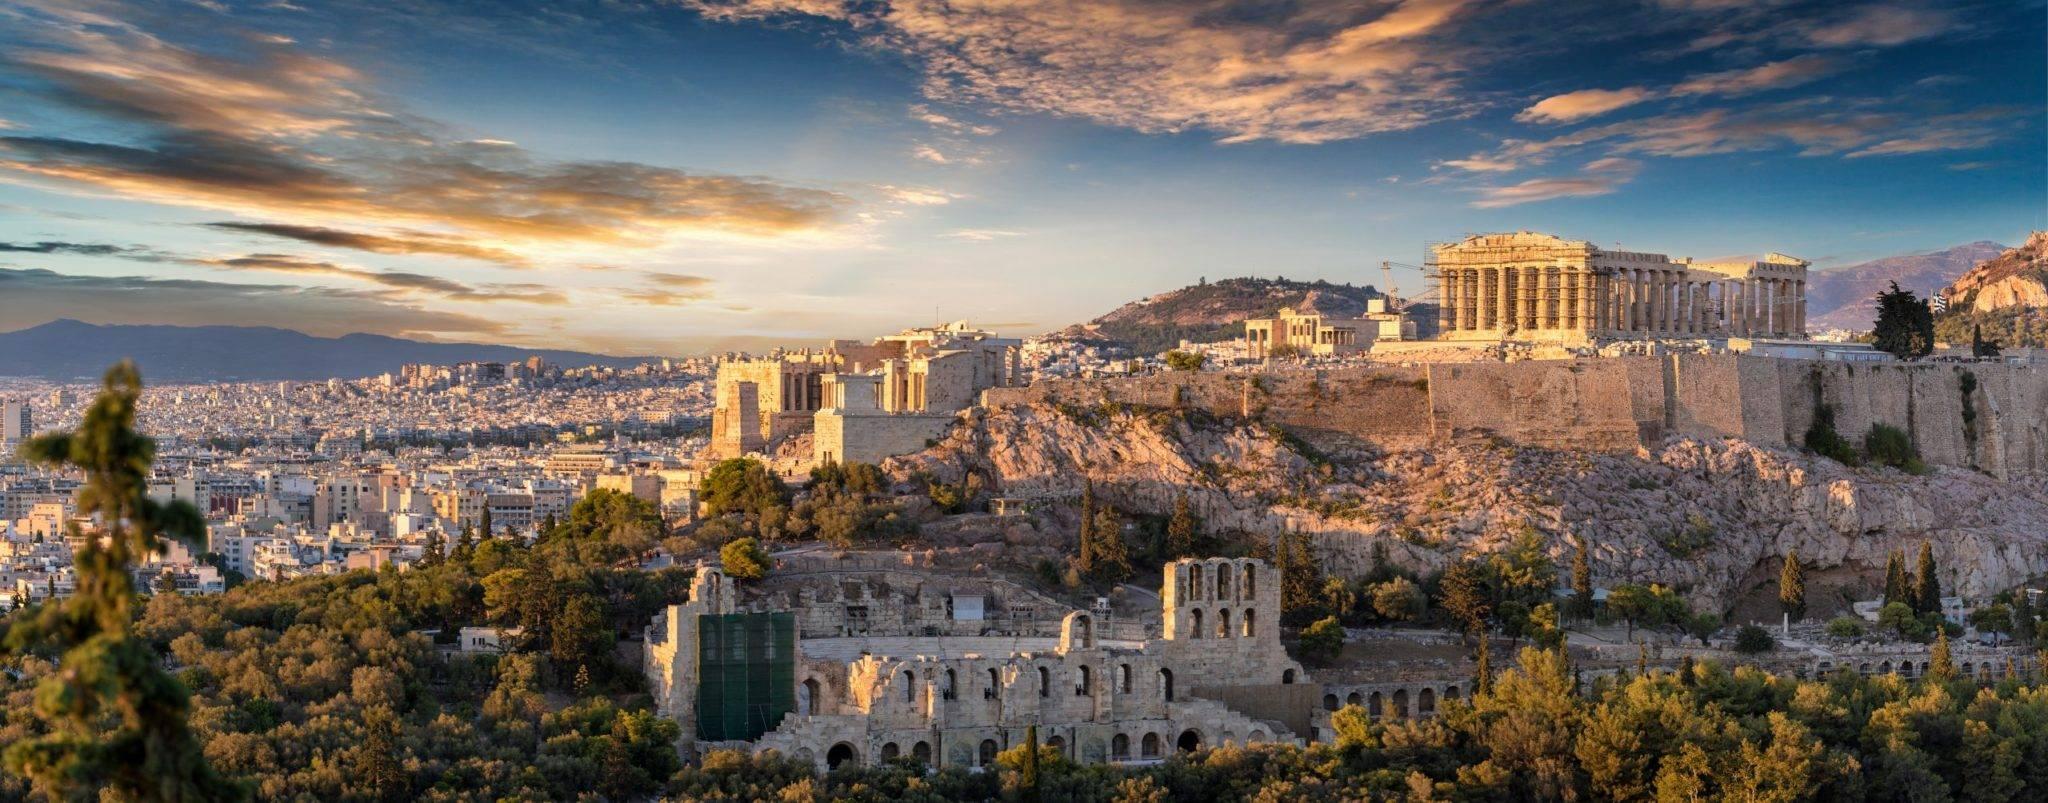 Akropolis, banner